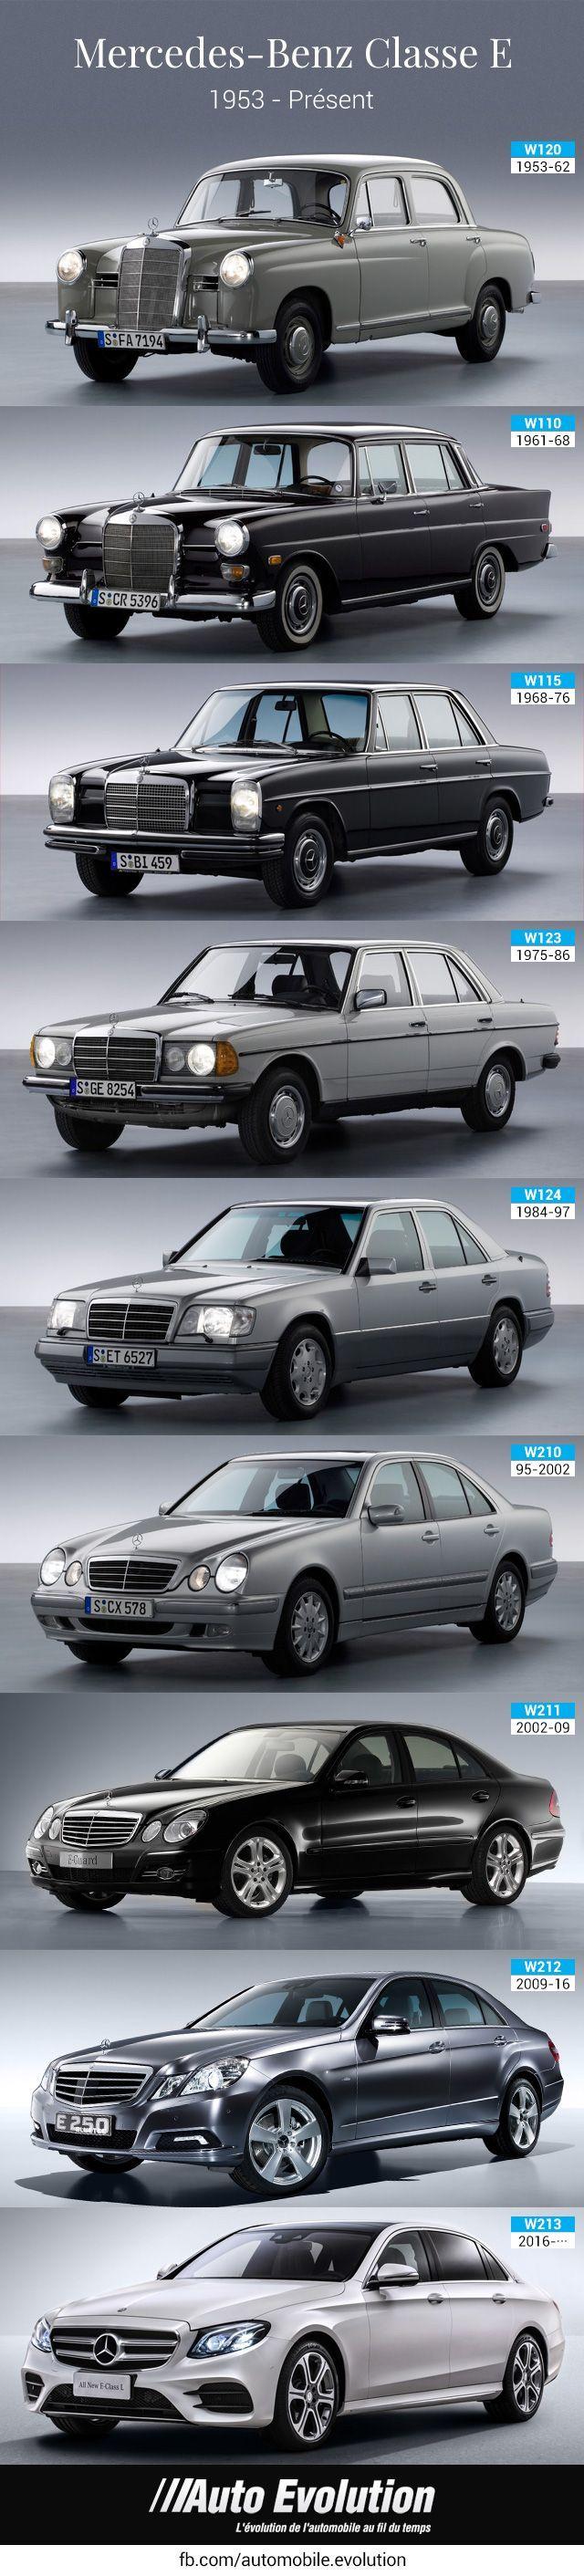 Mercedes Benz E class evolution Histoire Mercedes Benz Classe E –